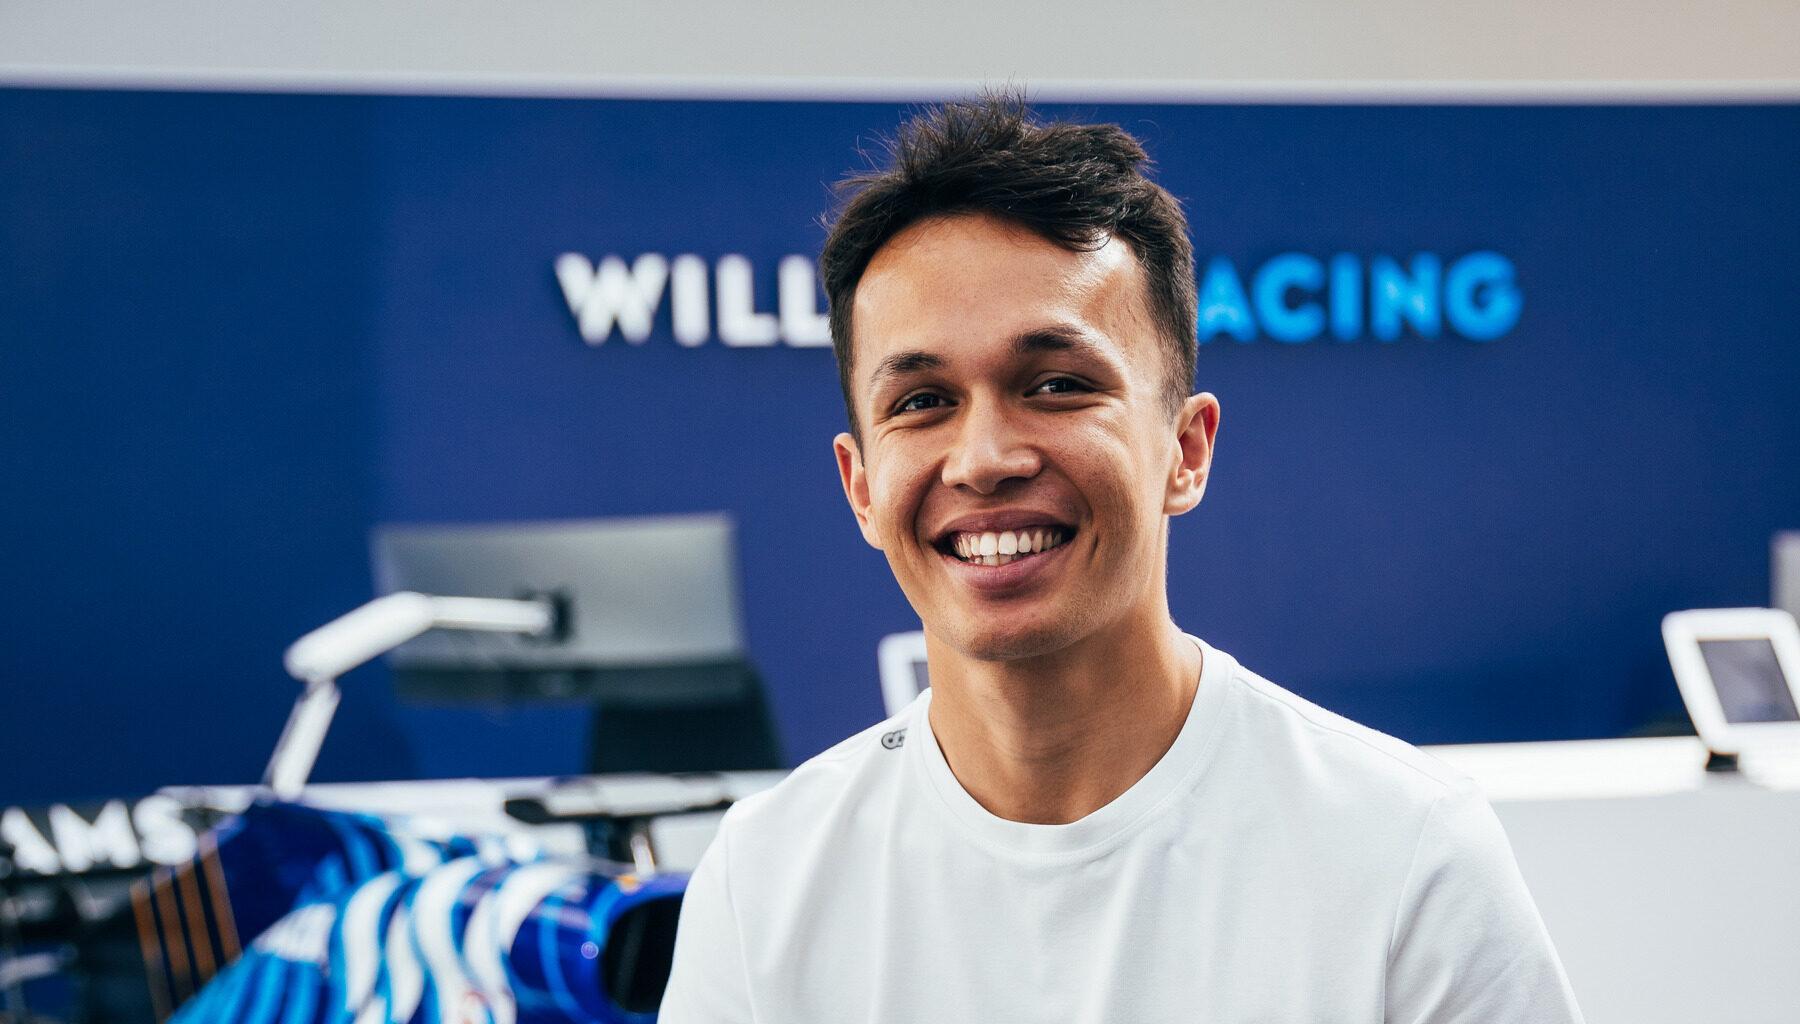 Red Bull го отпушти Албон за му обезбеди место во Williams